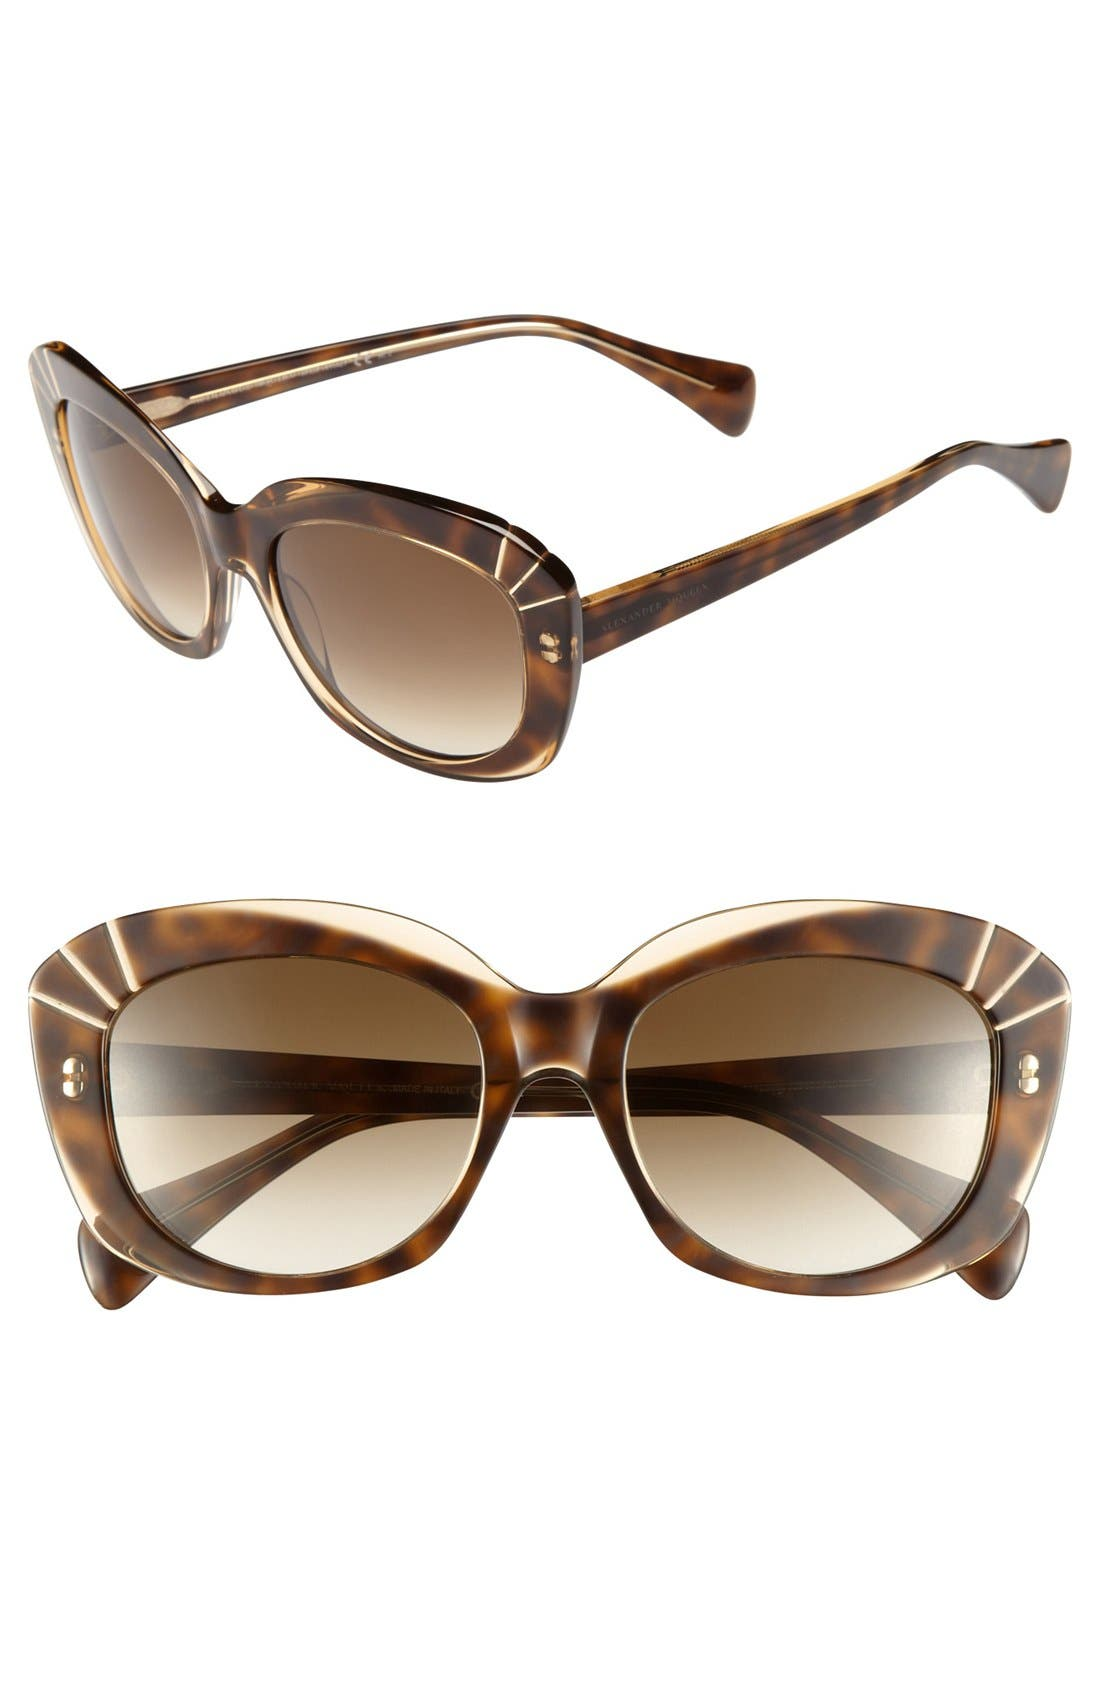 Main Image - Alexander McQueen 54mm Starburst Inset Sunglasses